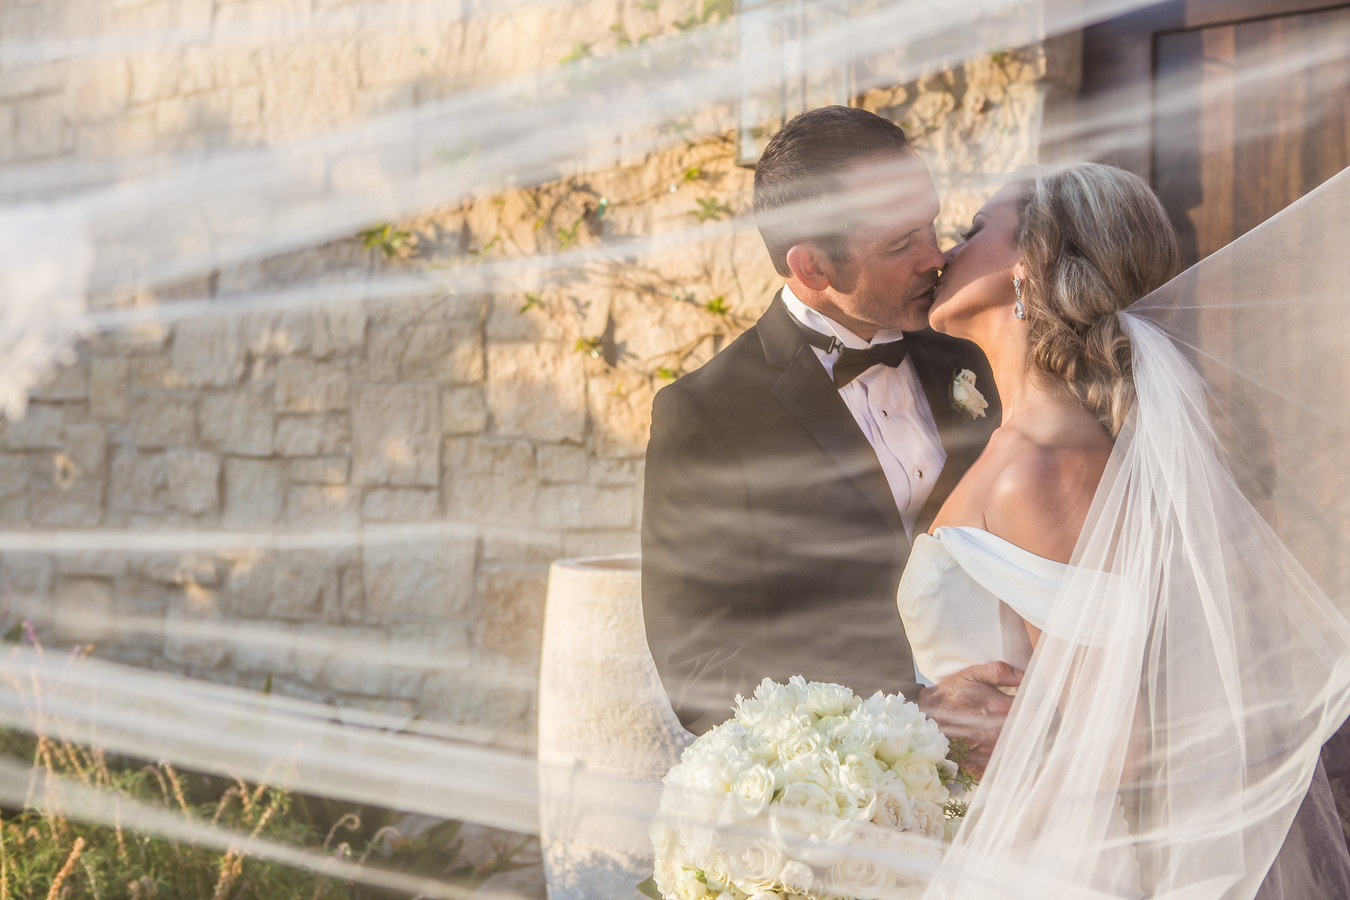 Berlynn Photography, San Diego Wedding Photography, Bride and Groom kiss